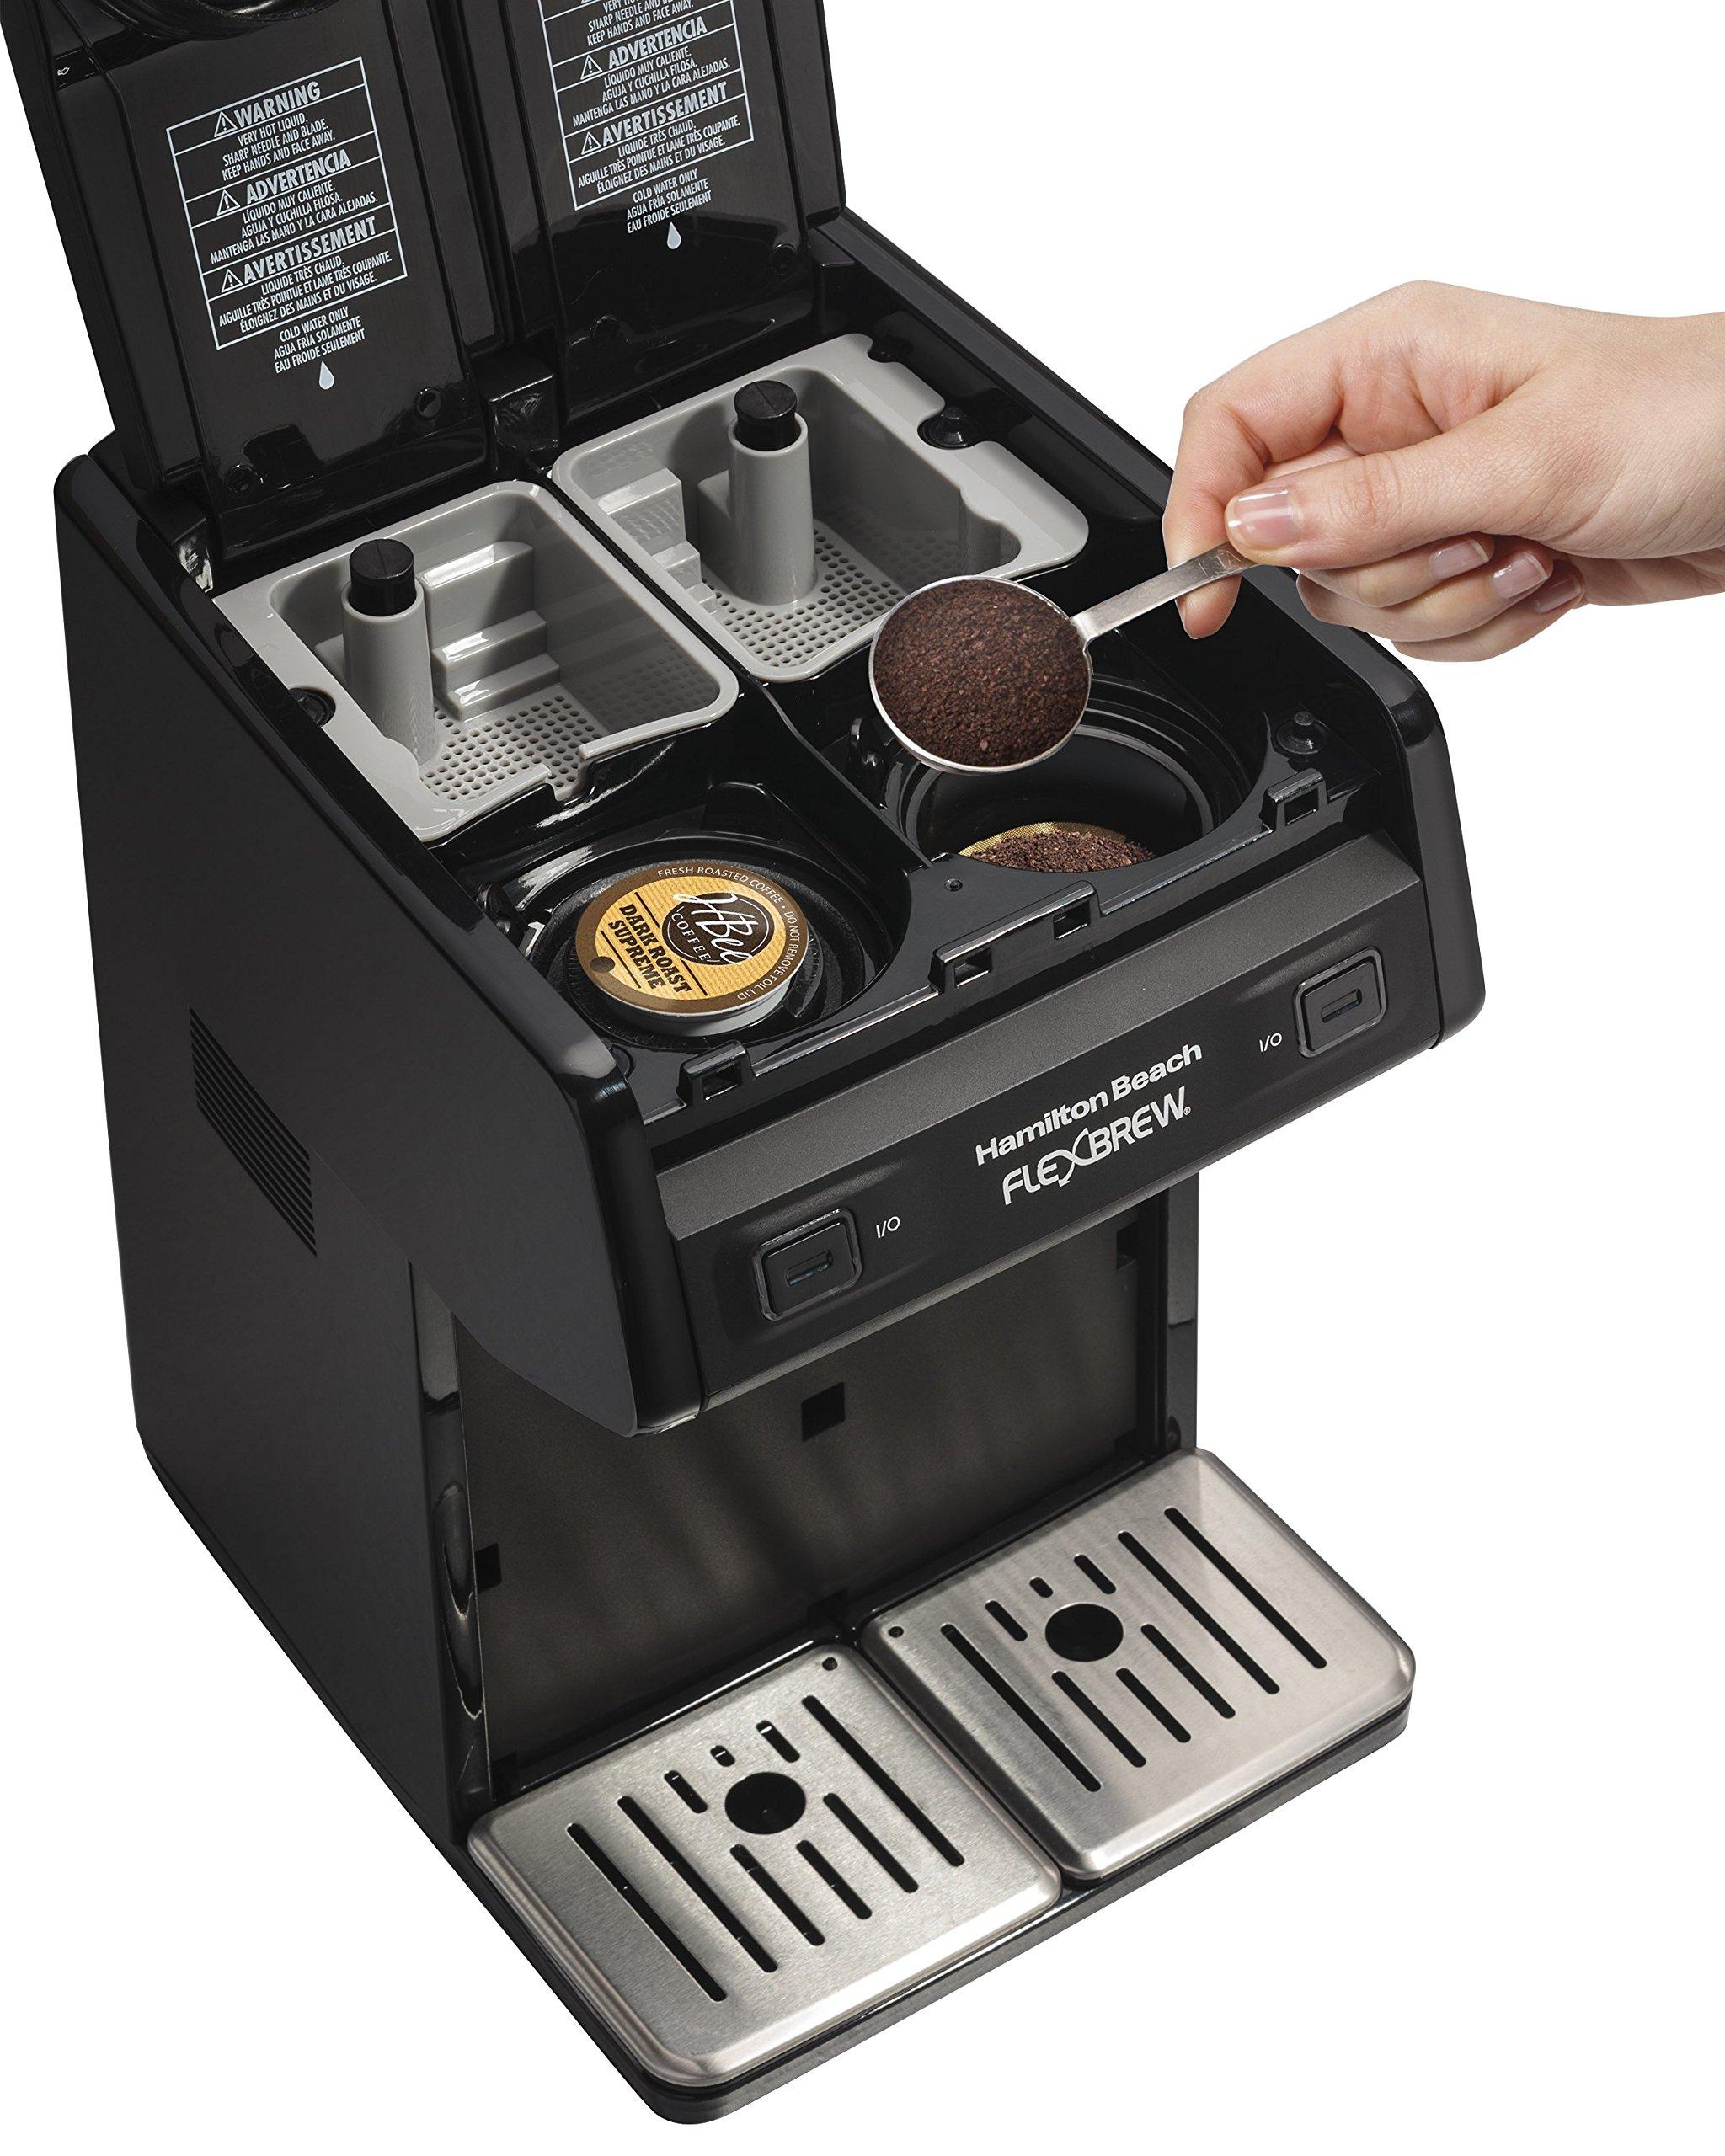 Hamilton Beach 49998 FlexBrew Dual Single Serve Coffee Maker, Black by Hamilton Beach (Image #4)